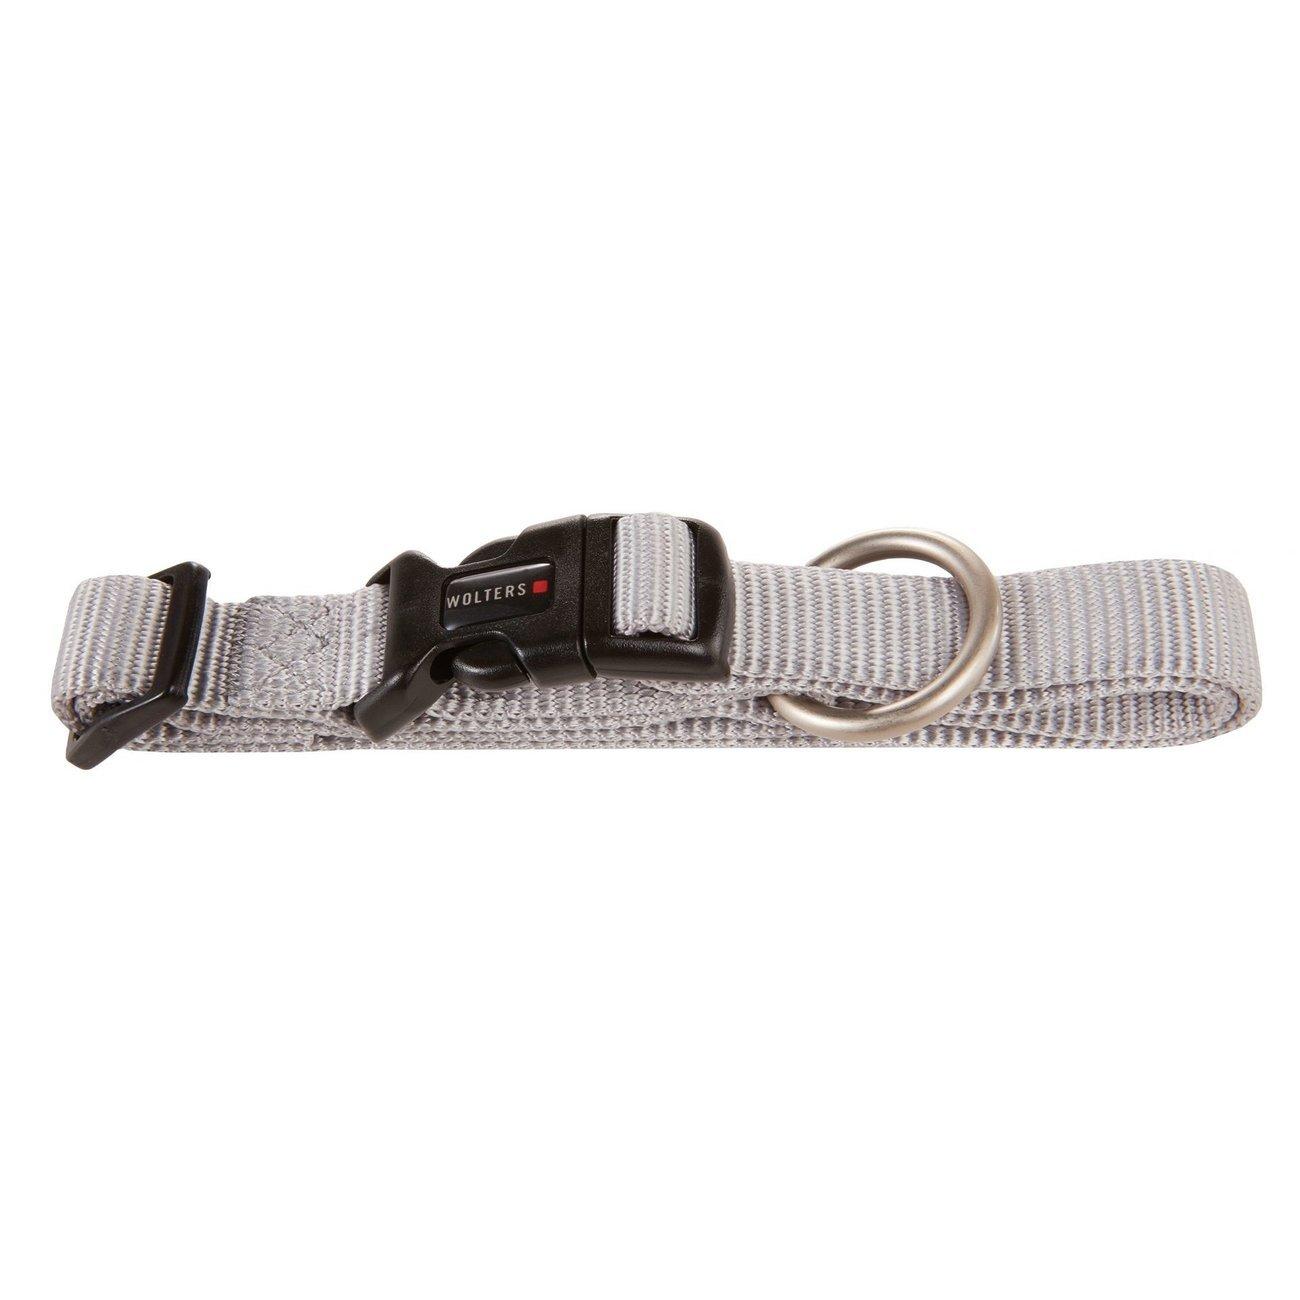 Wolters Halsband Extra Breit Professional Nylon, Bild 11